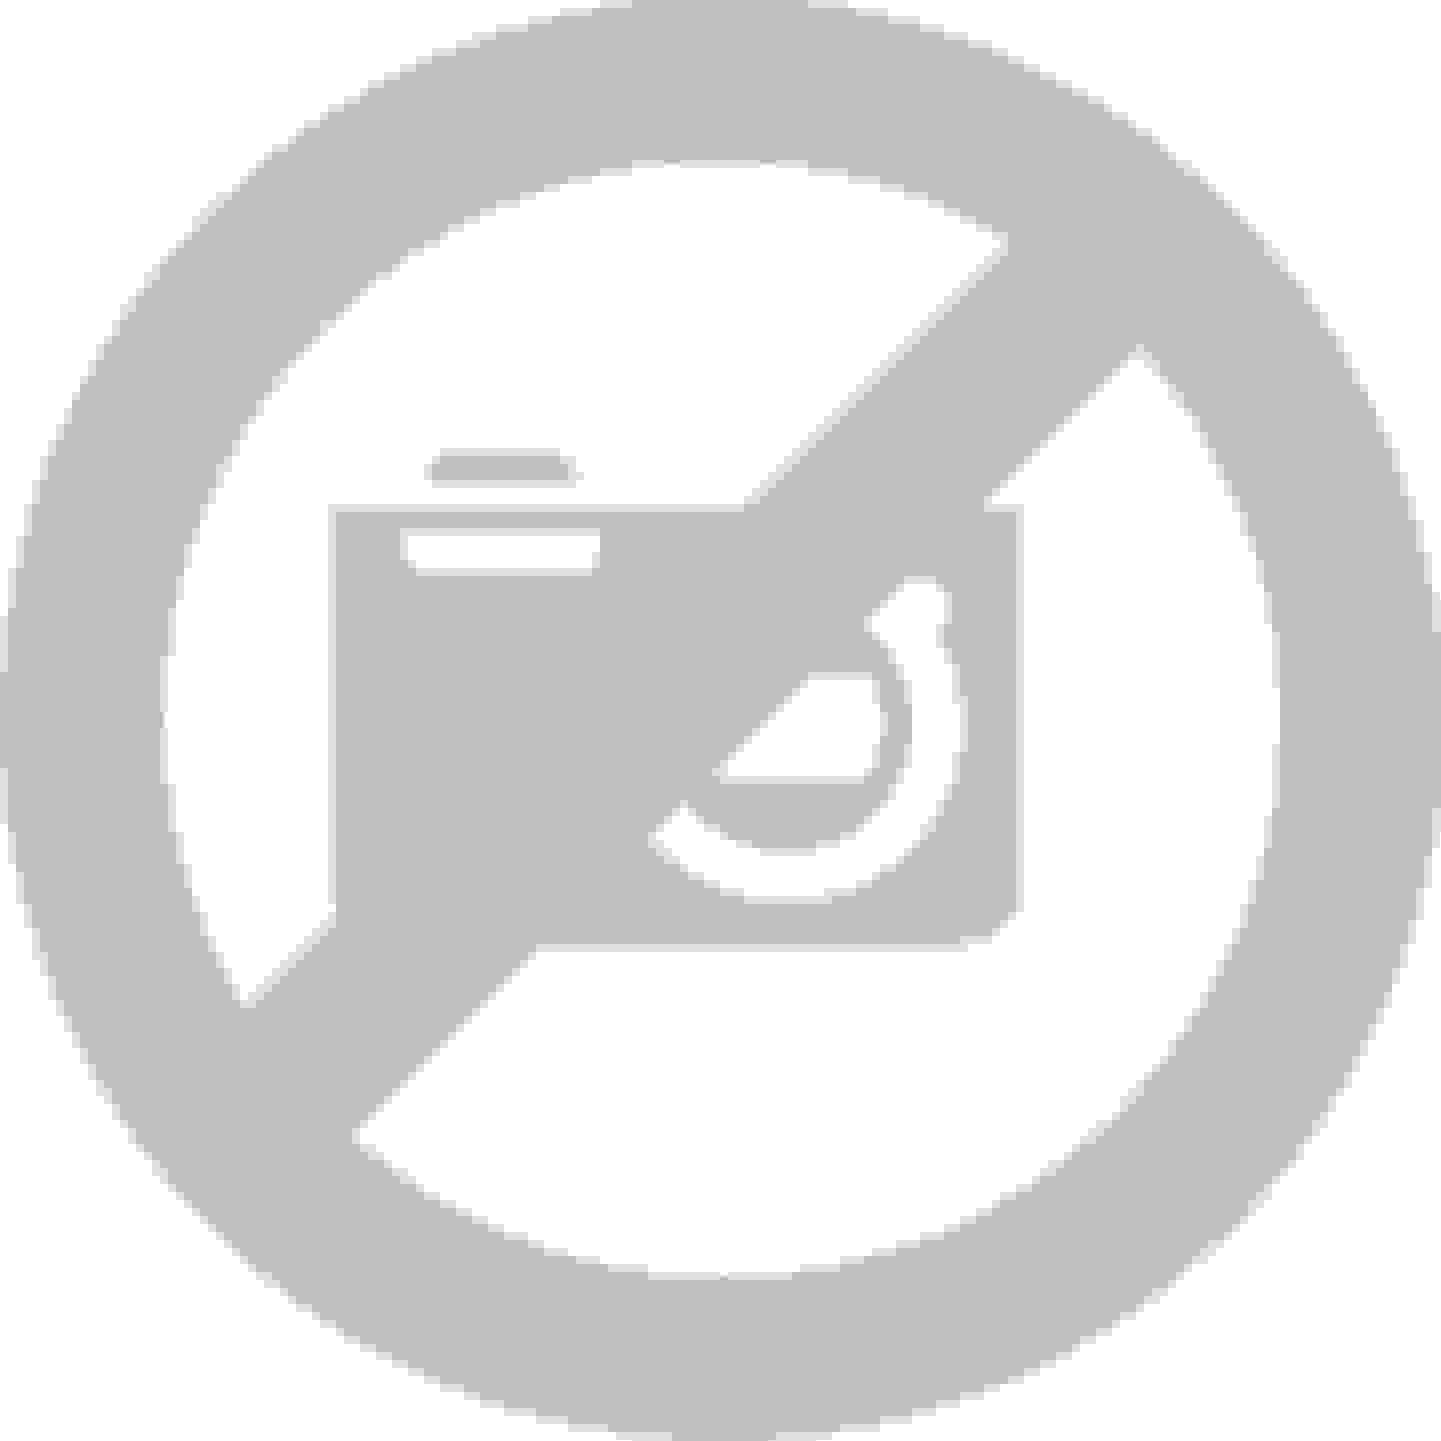 Epson EcoTank ET-3700 Tintenstrahl-Multifunktionsdrucker